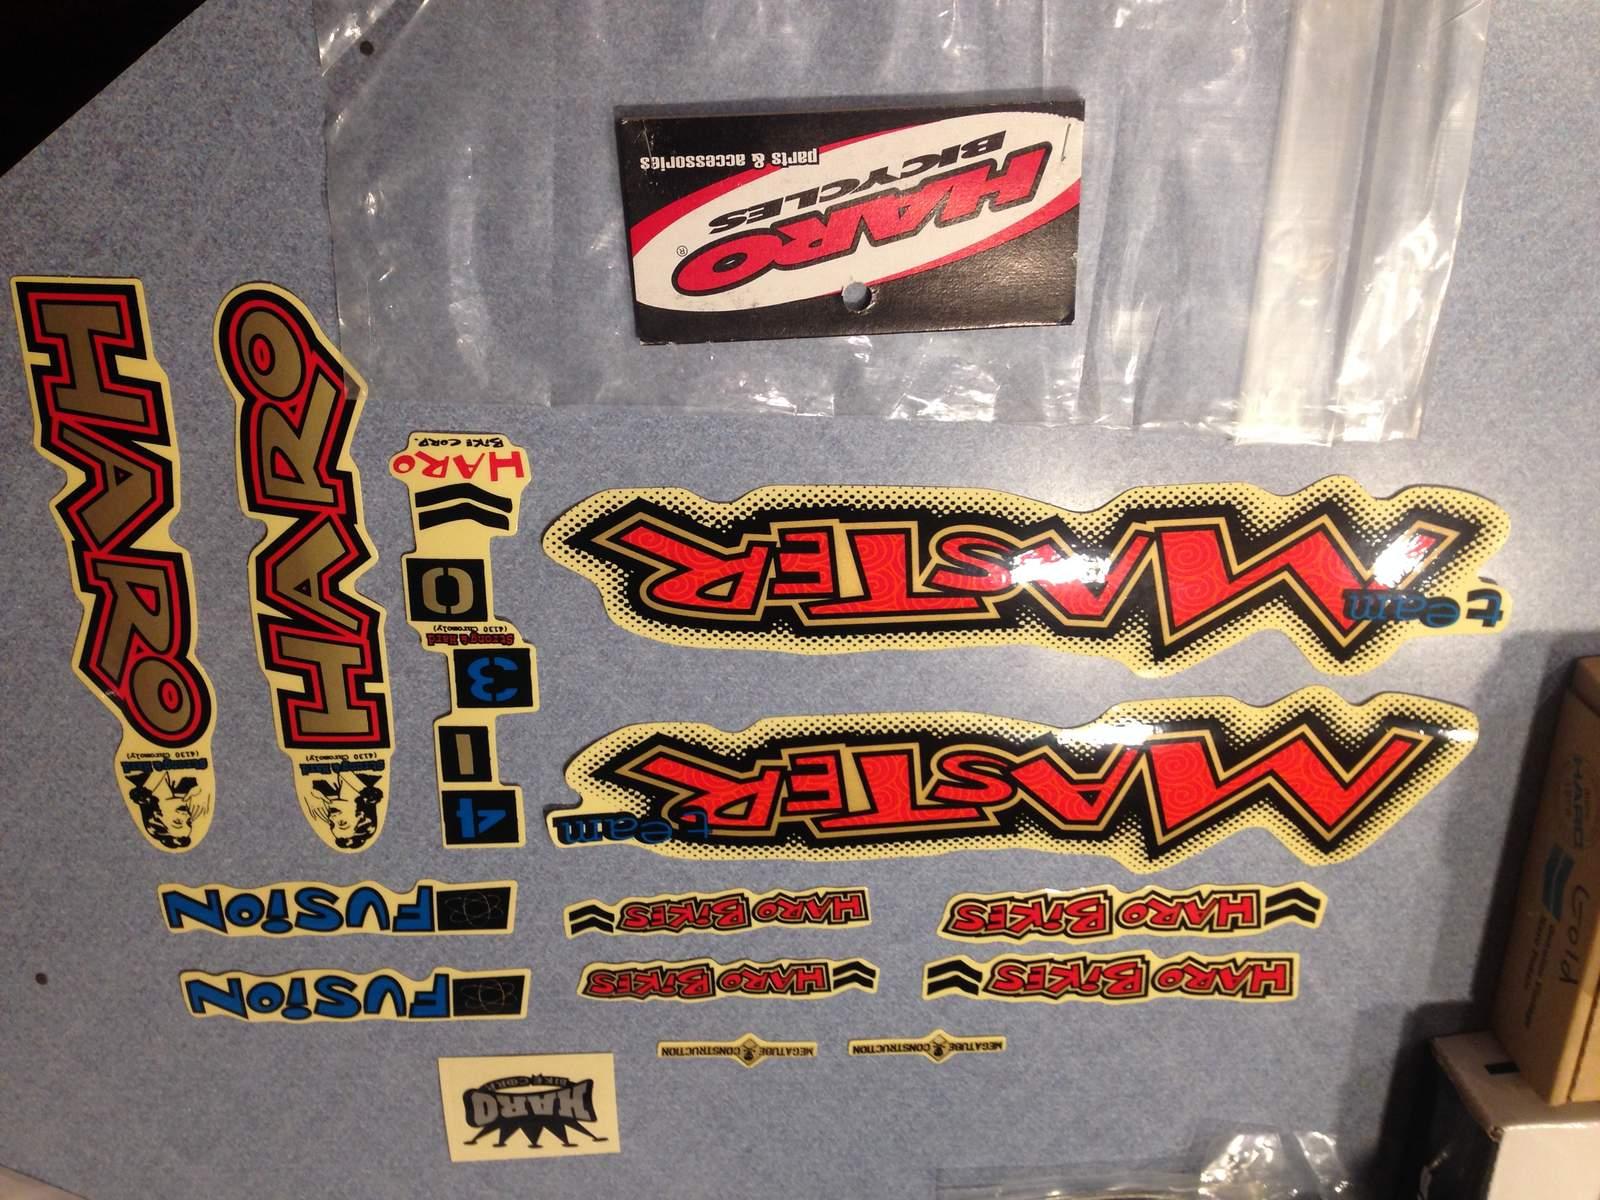 http://uploads.bmxmuseum.com/user-images/248463/img_09965c007cbfaa.jpg